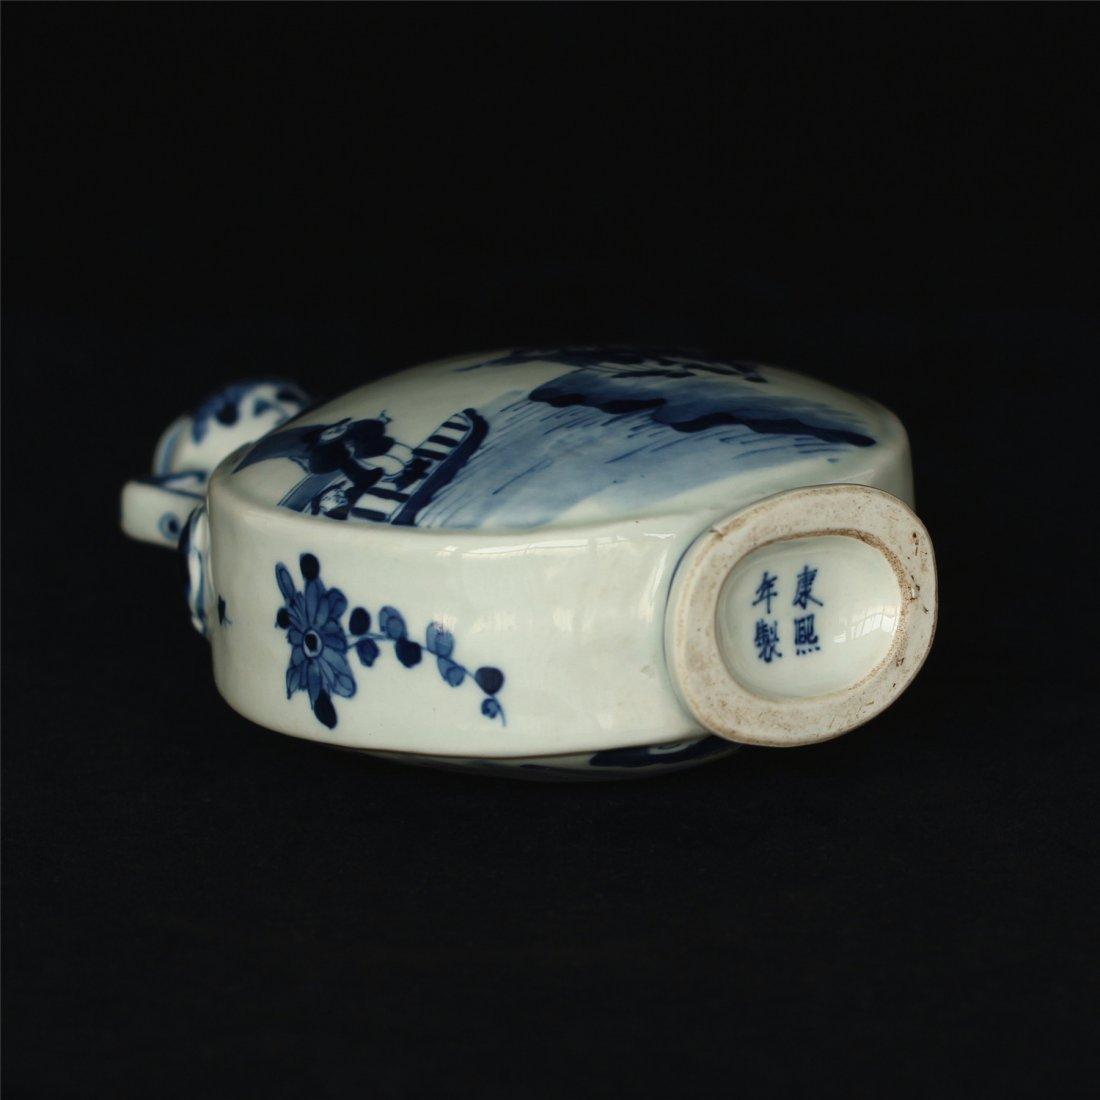 Blue and white porcelain vase of Qing Dynasty KangXi - 7